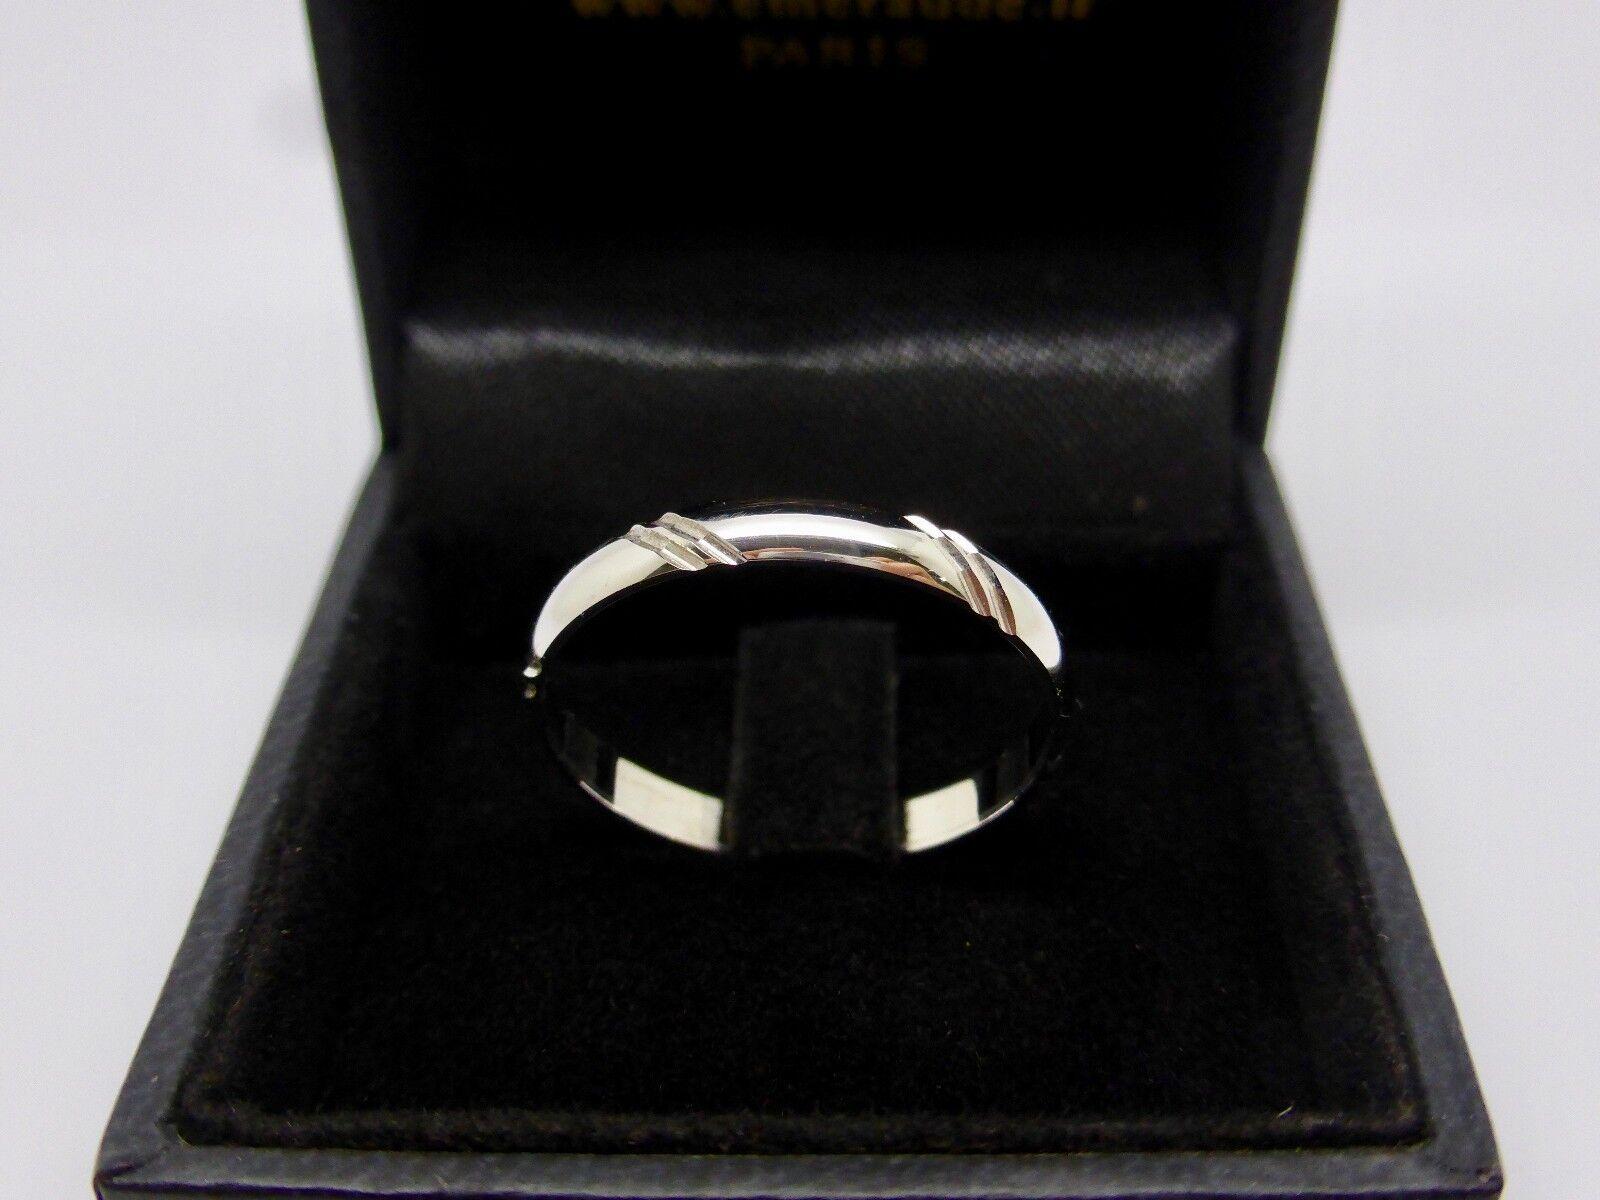 WEDDING RING FANTASY gold WHITE 18K 750 000 0 1 8in 0.0829oz T63 B54659